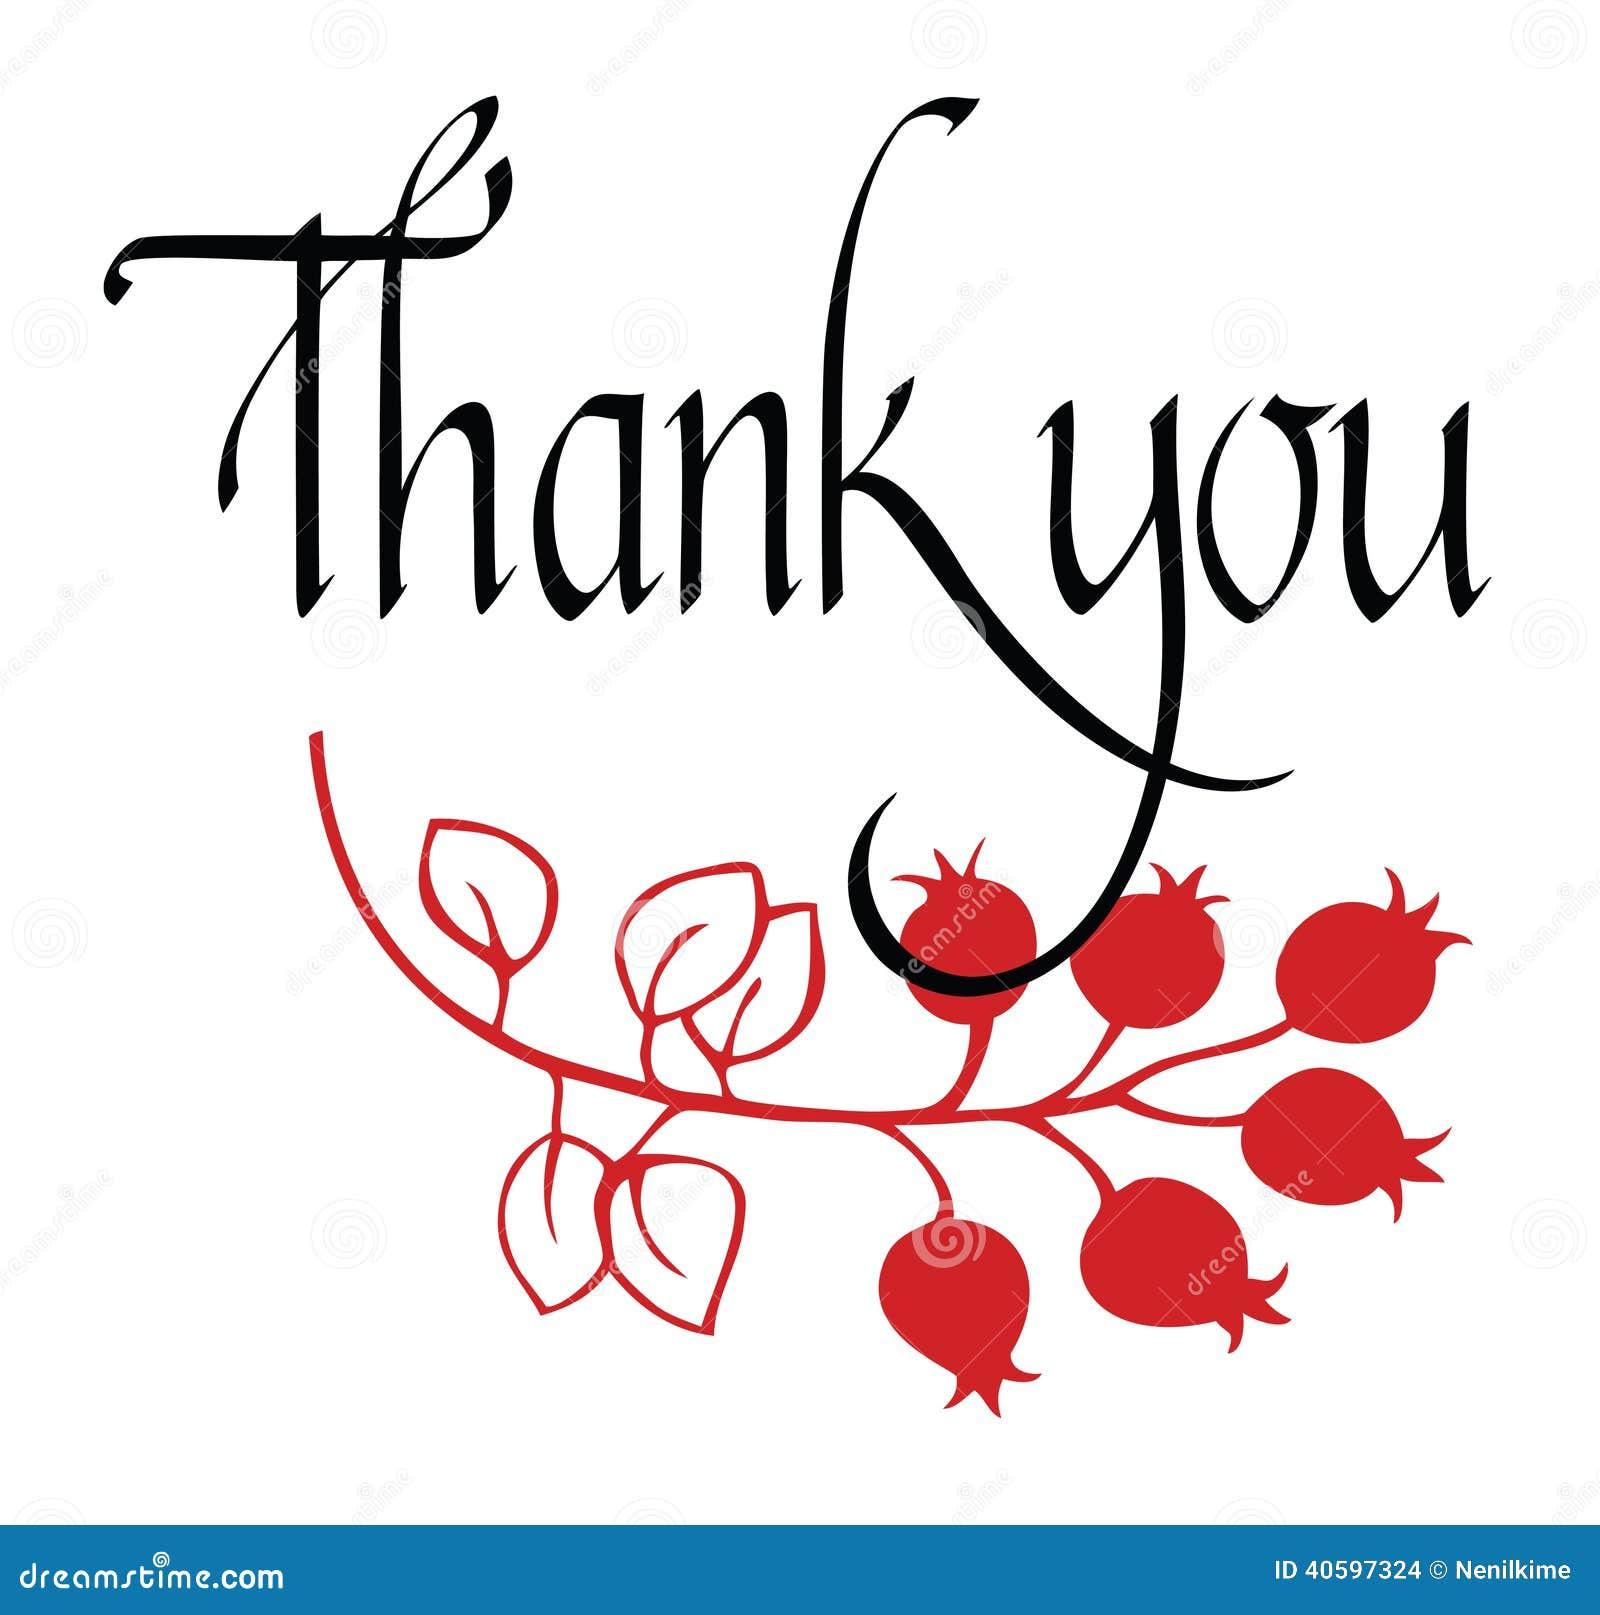 Design Thank You Card essay citation format